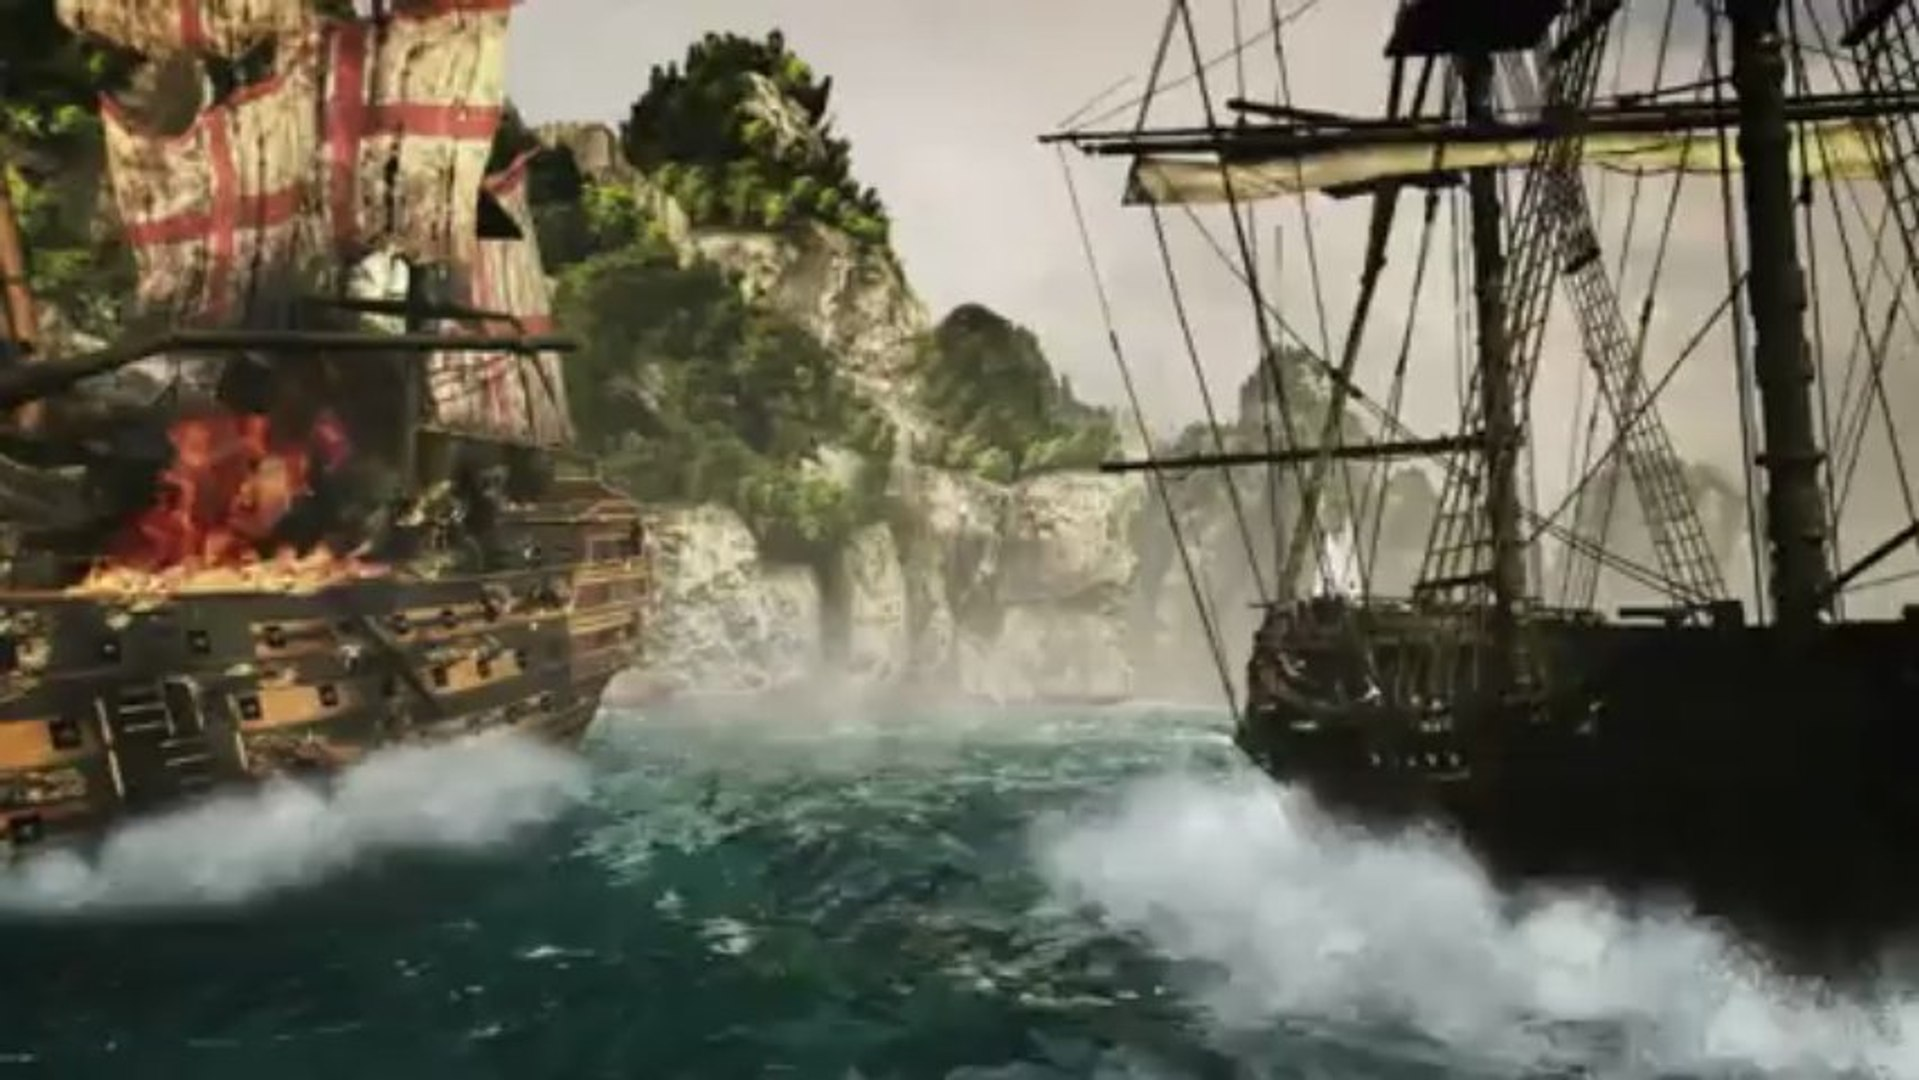 Assassin's Creed IV : Black Flag (PS4) - Assassin's Creed IV: Black Flag trailer gameplay